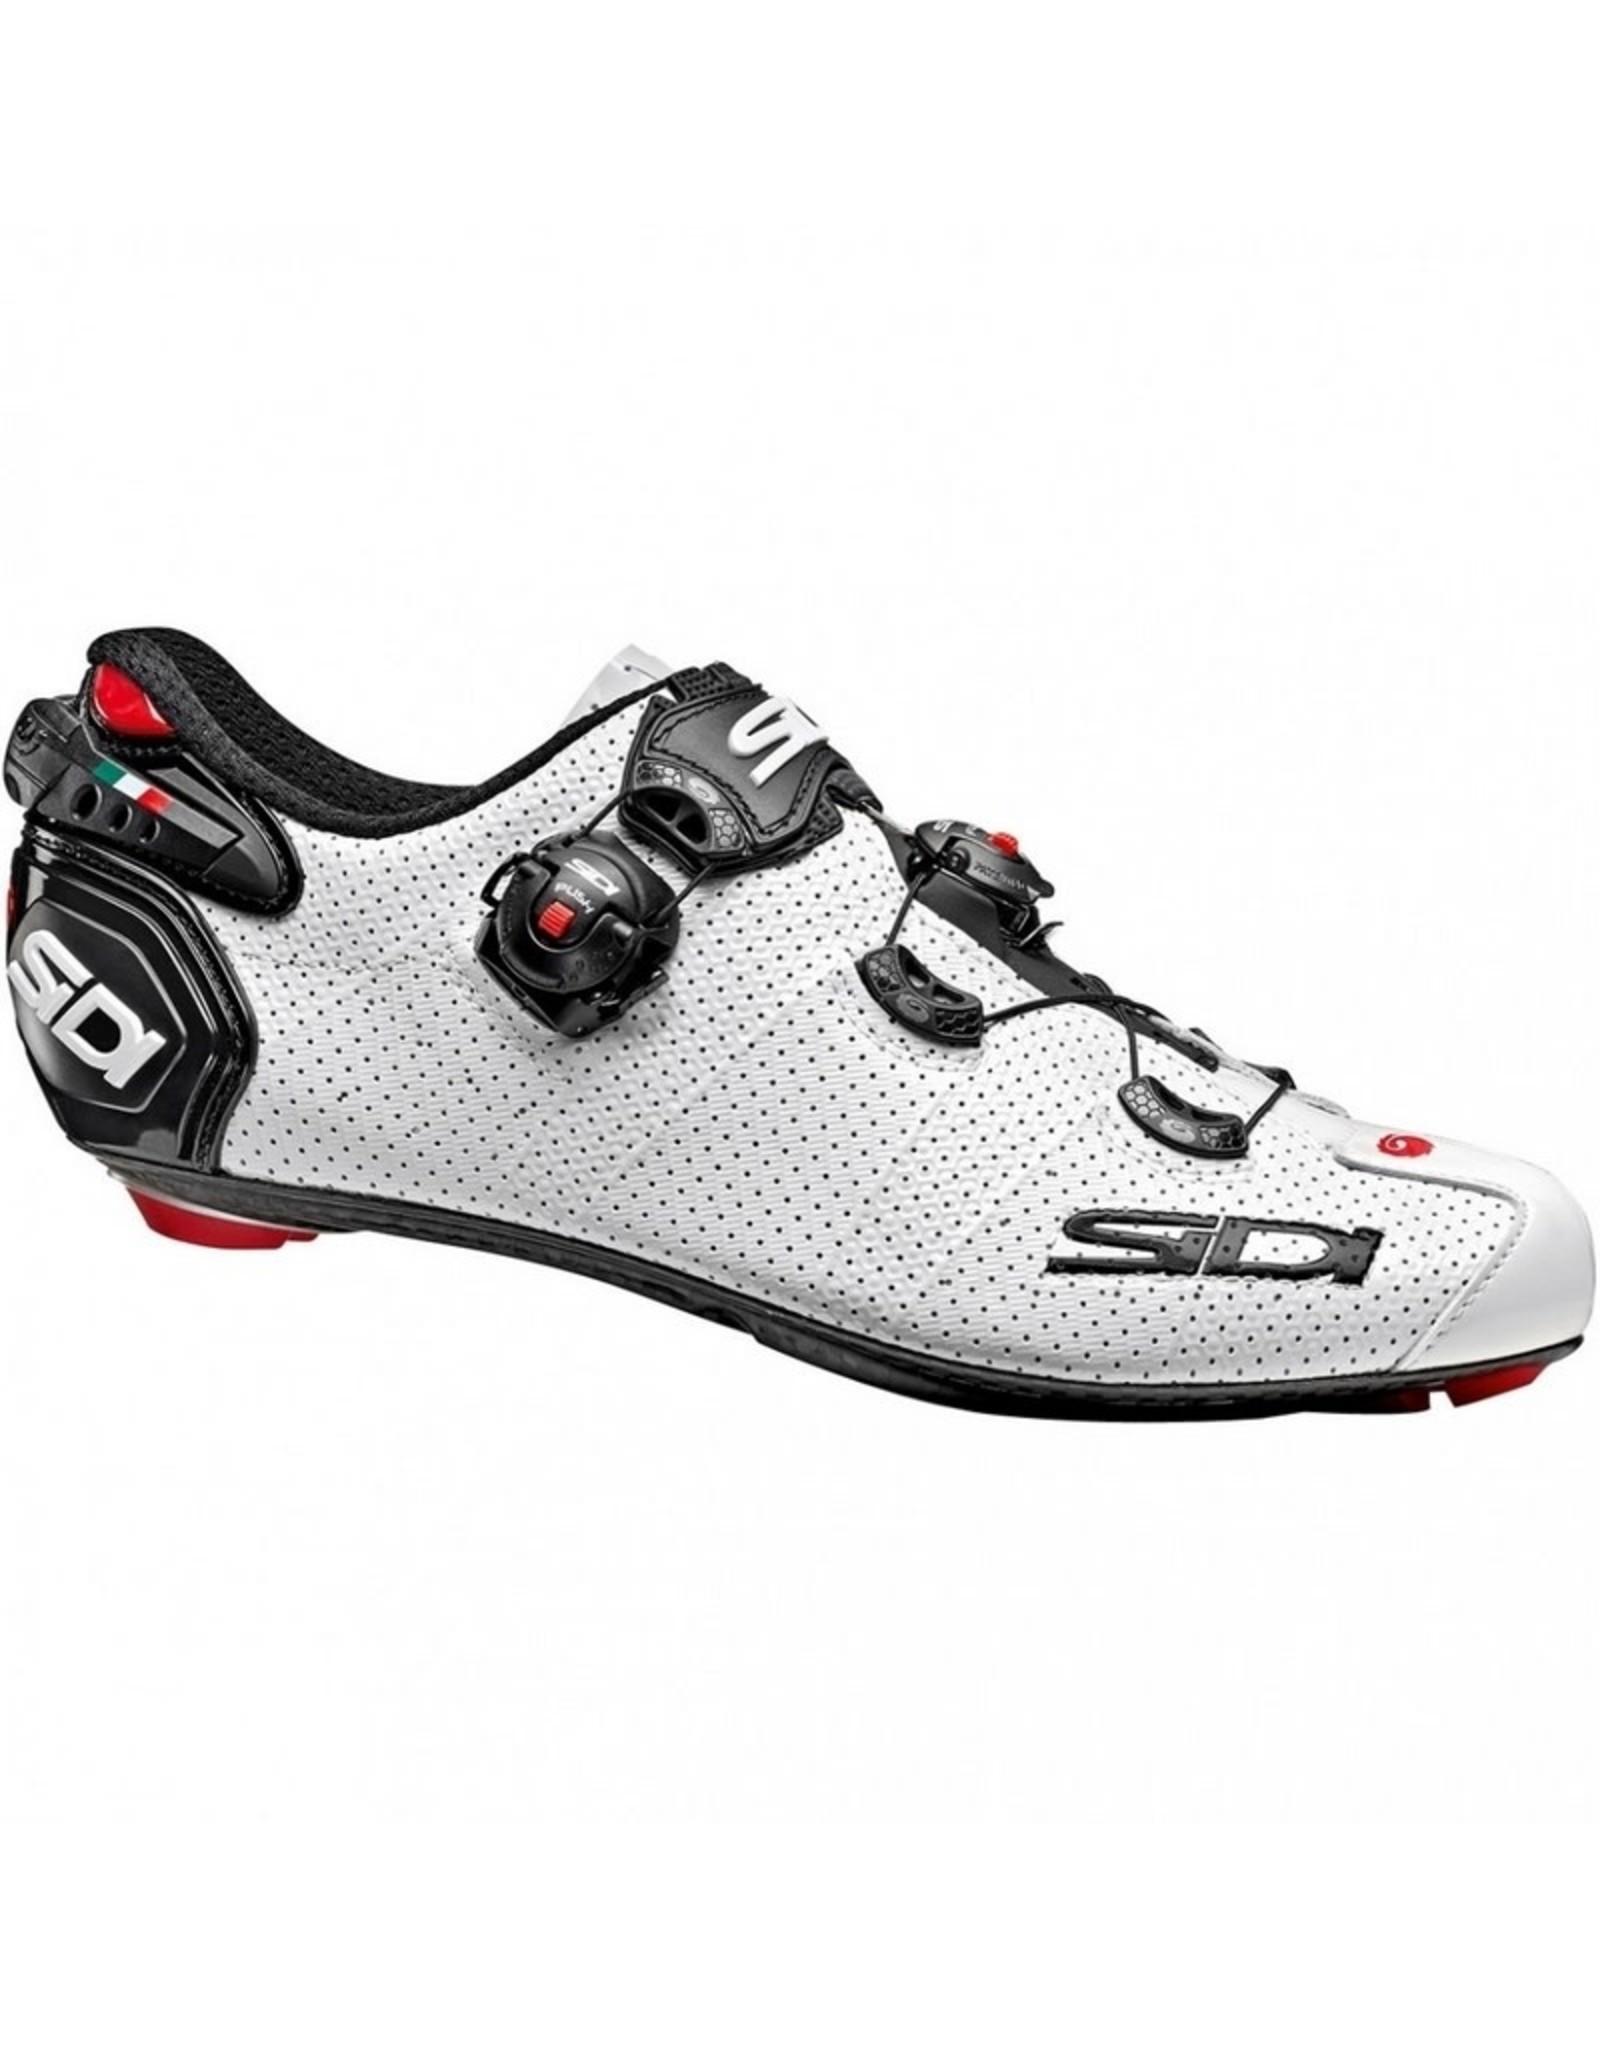 Sidi Sidi Shoes Wire 2 Carbon Air White/Black